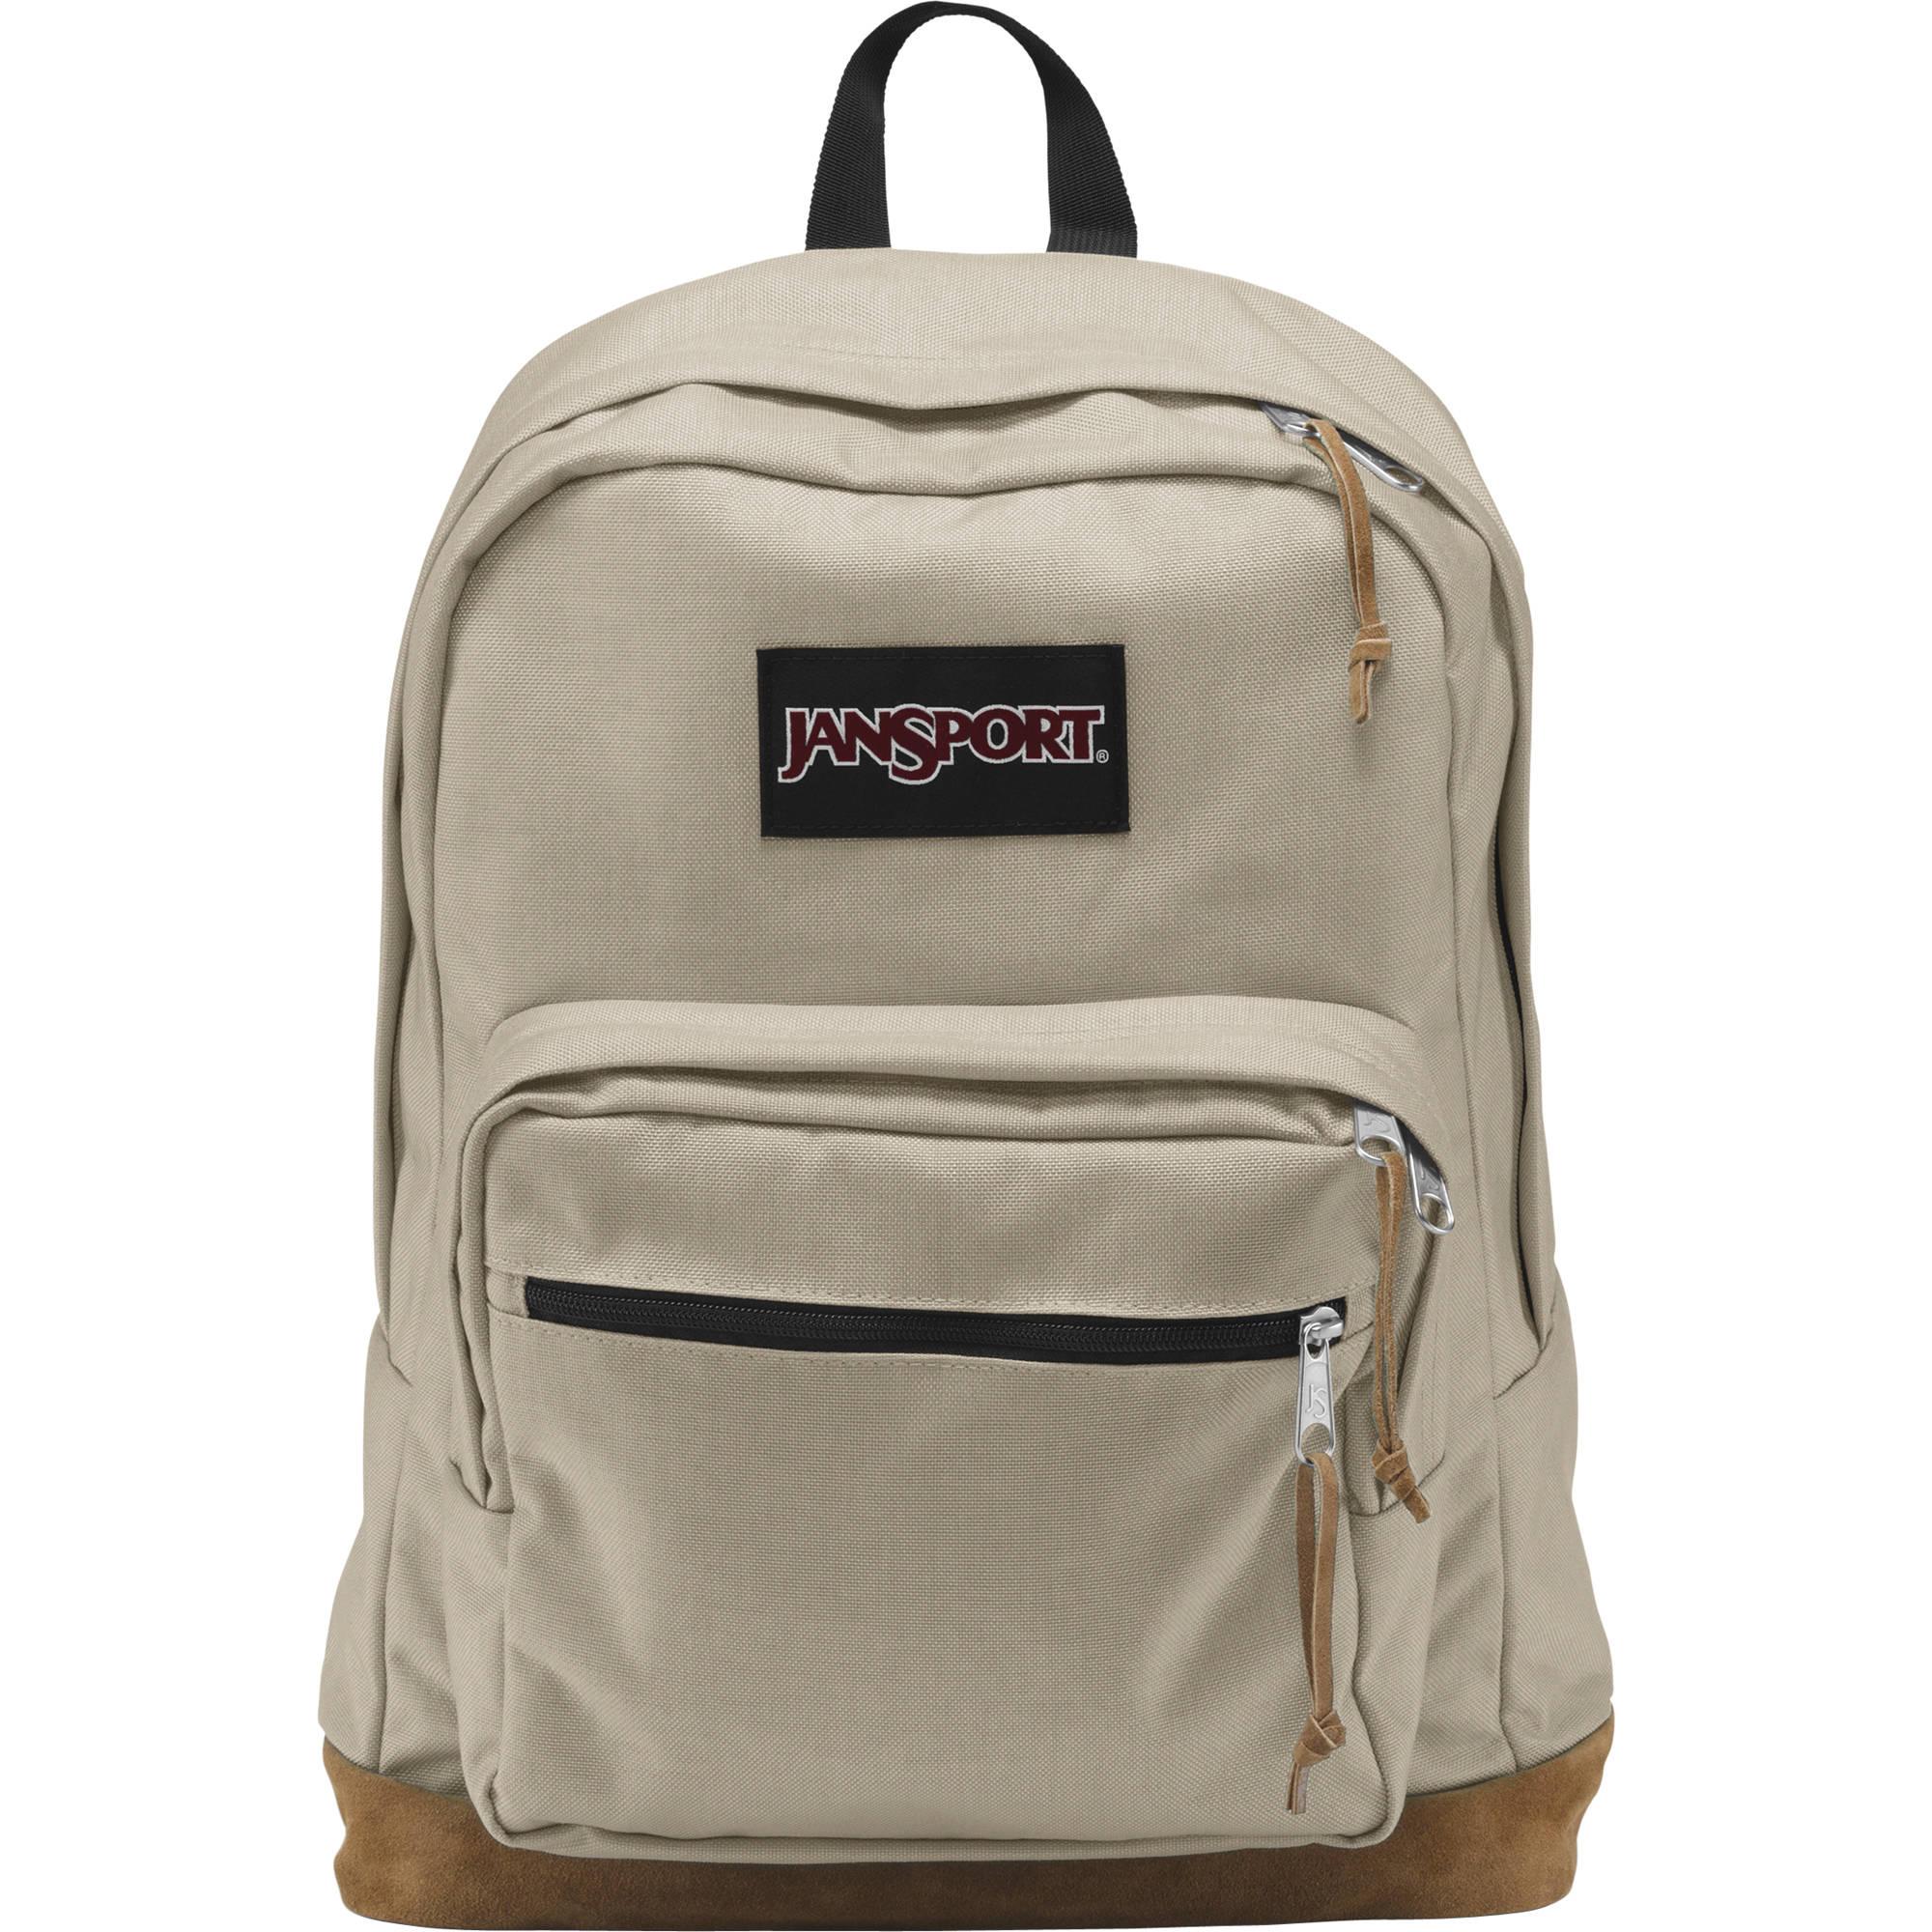 Jansport Canada Backpacks – TrendBackpack